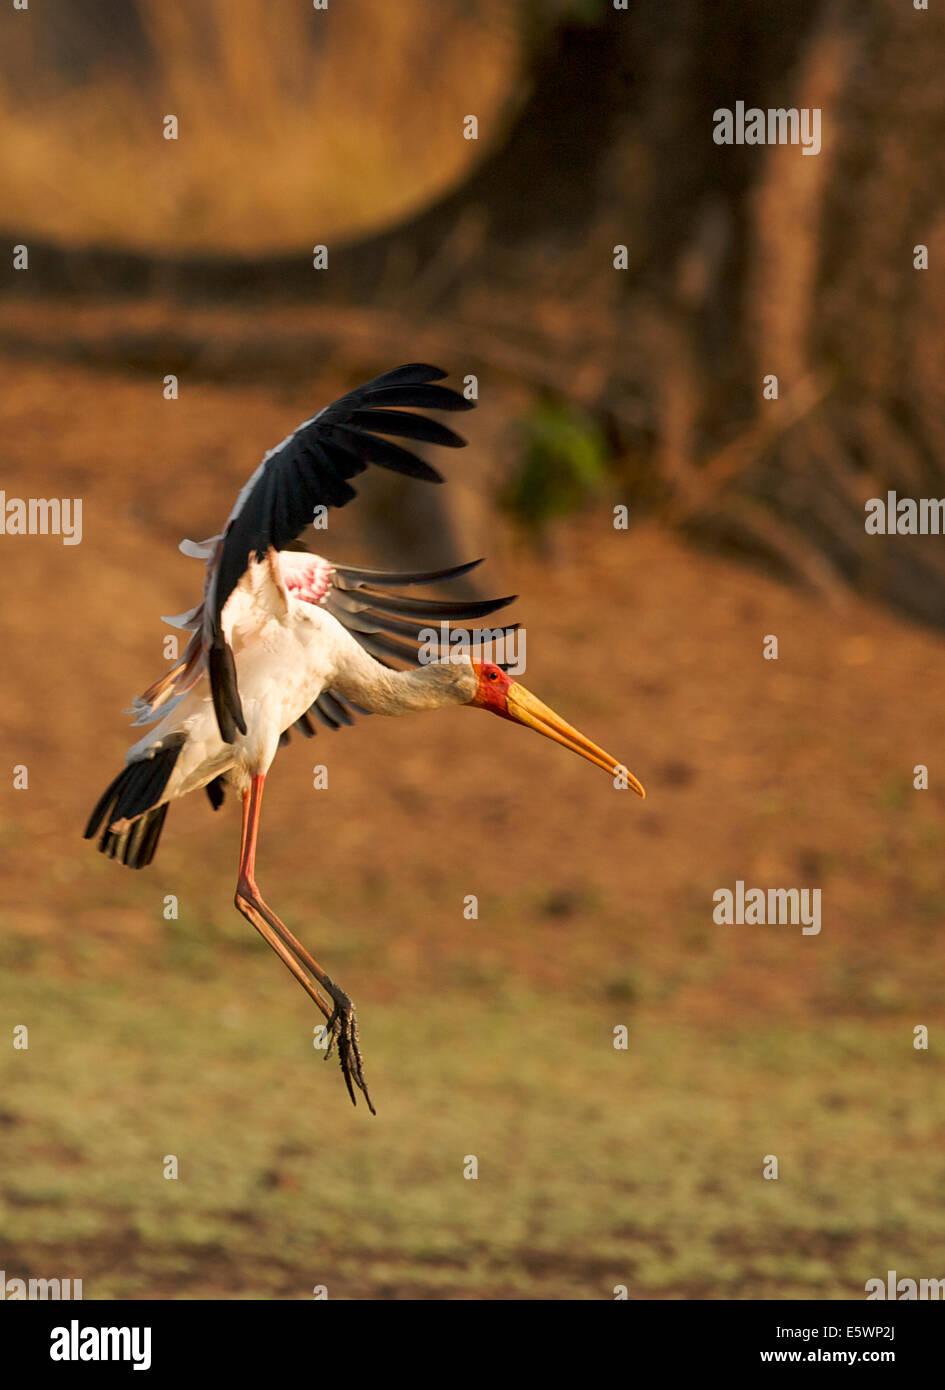 Gelb-billed Storch Landung auf Rasen, Mana Pools, Simbabwe Stockbild